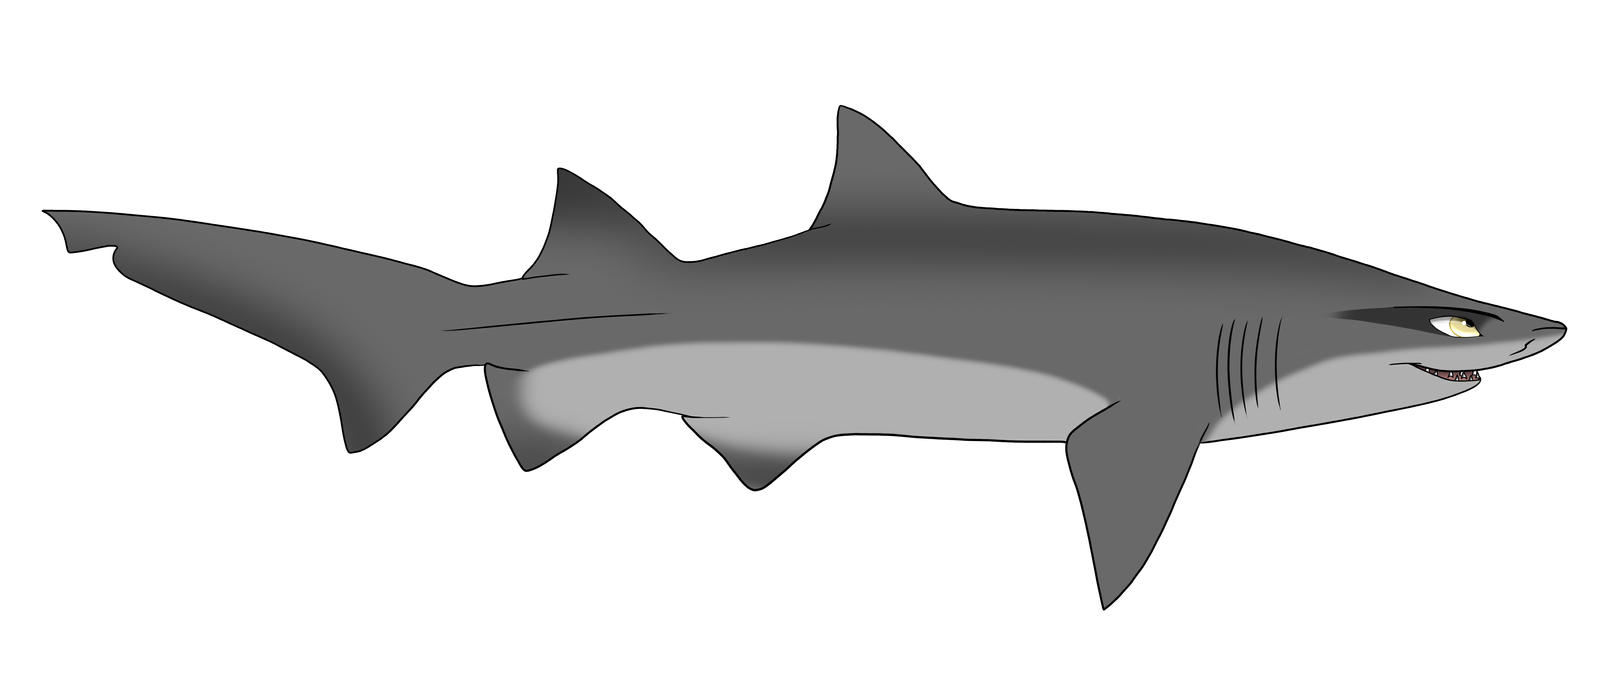 Sand tiger shark information amp pictures of sand tiger sharks - Sand Tiger Shark Drawing Photo 5